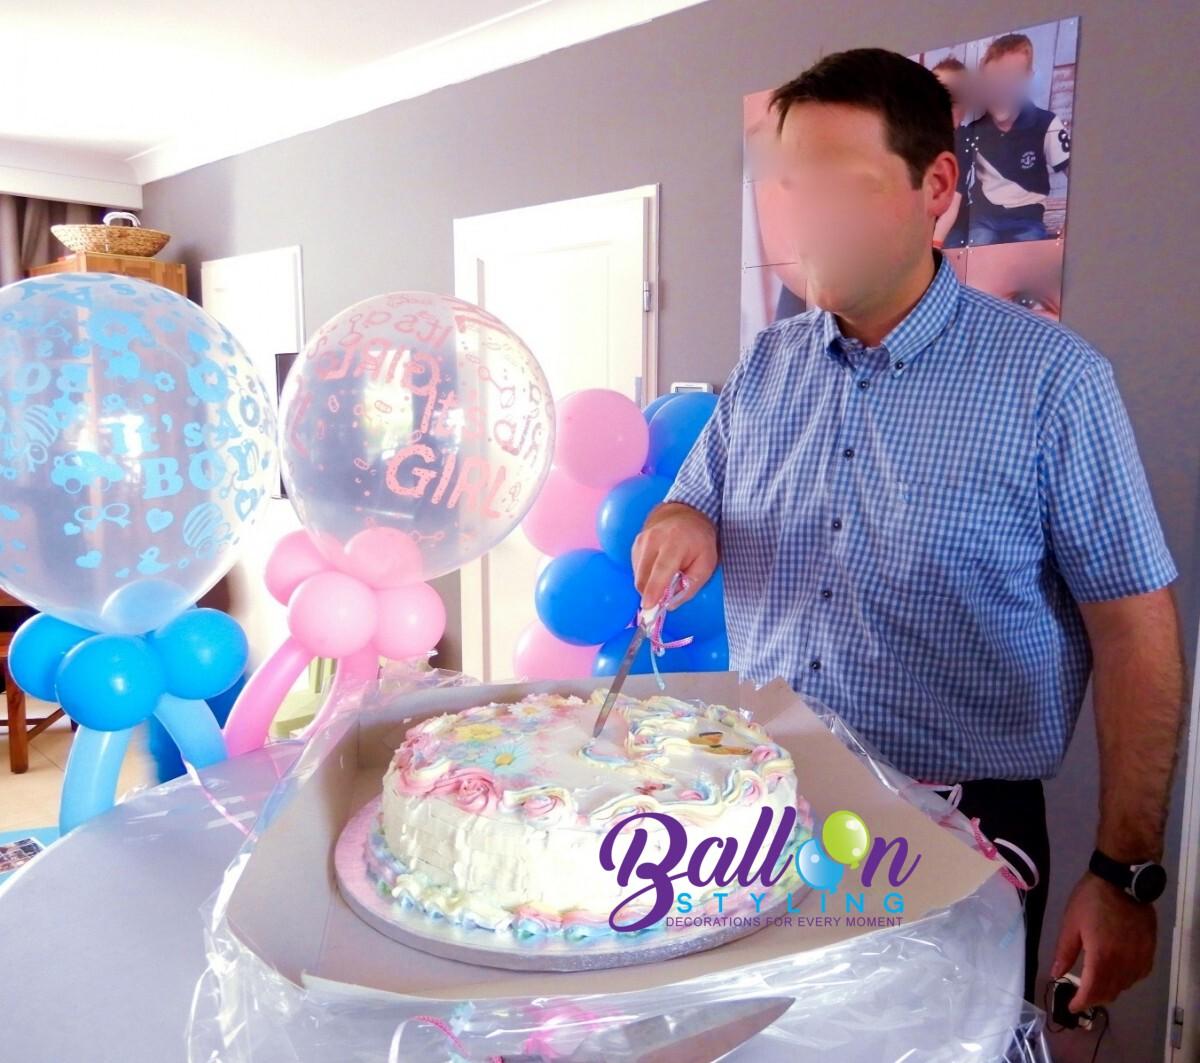 Balloon-Styling-baby-fopspeen-gender-reveal-decoratie-babyshower-babykraam gender reveal ballonnen Tilburg